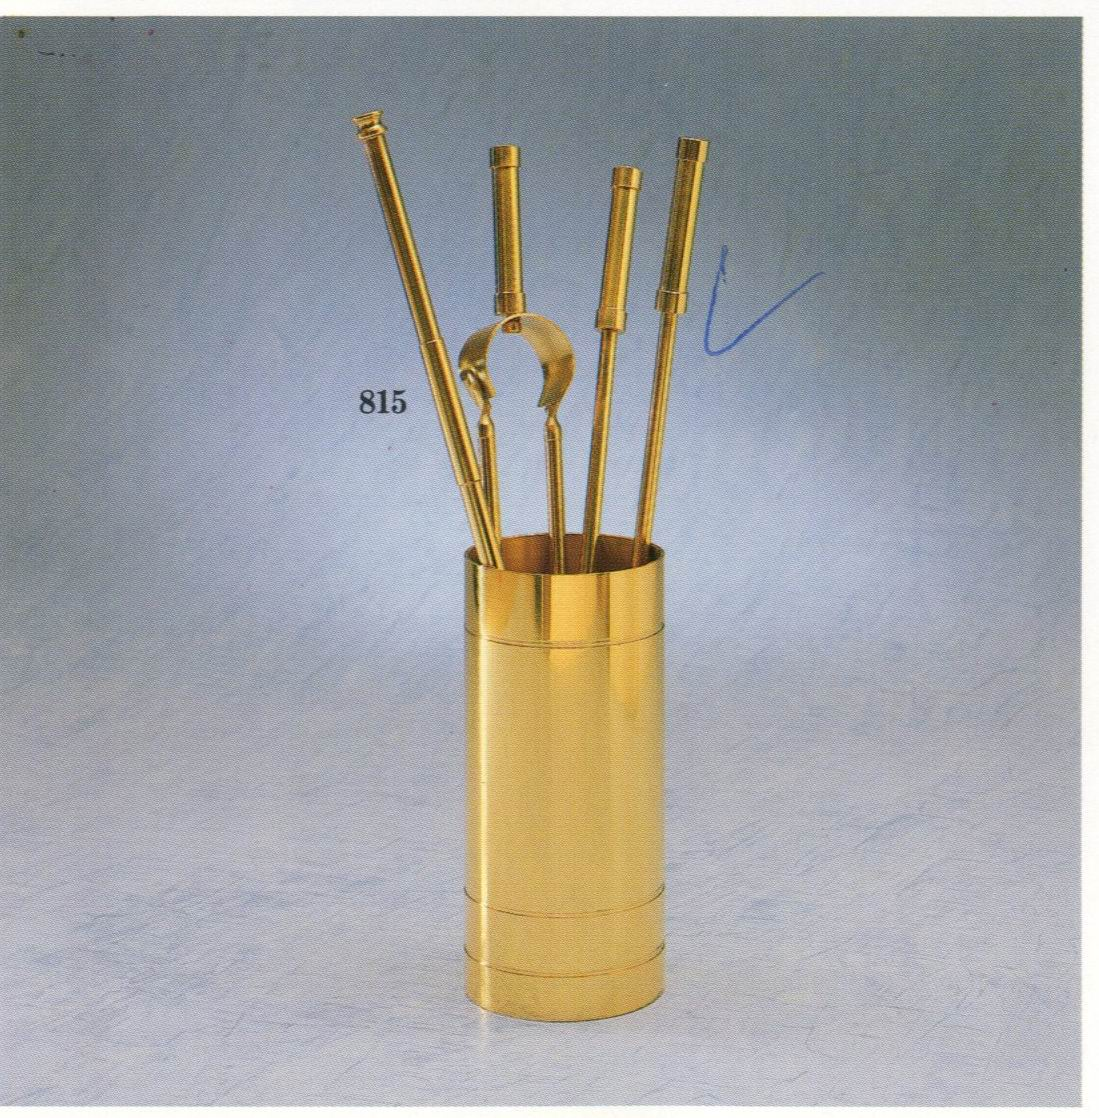 Набор аксессуаров для камина, латунь. Модель Palazzetti 815